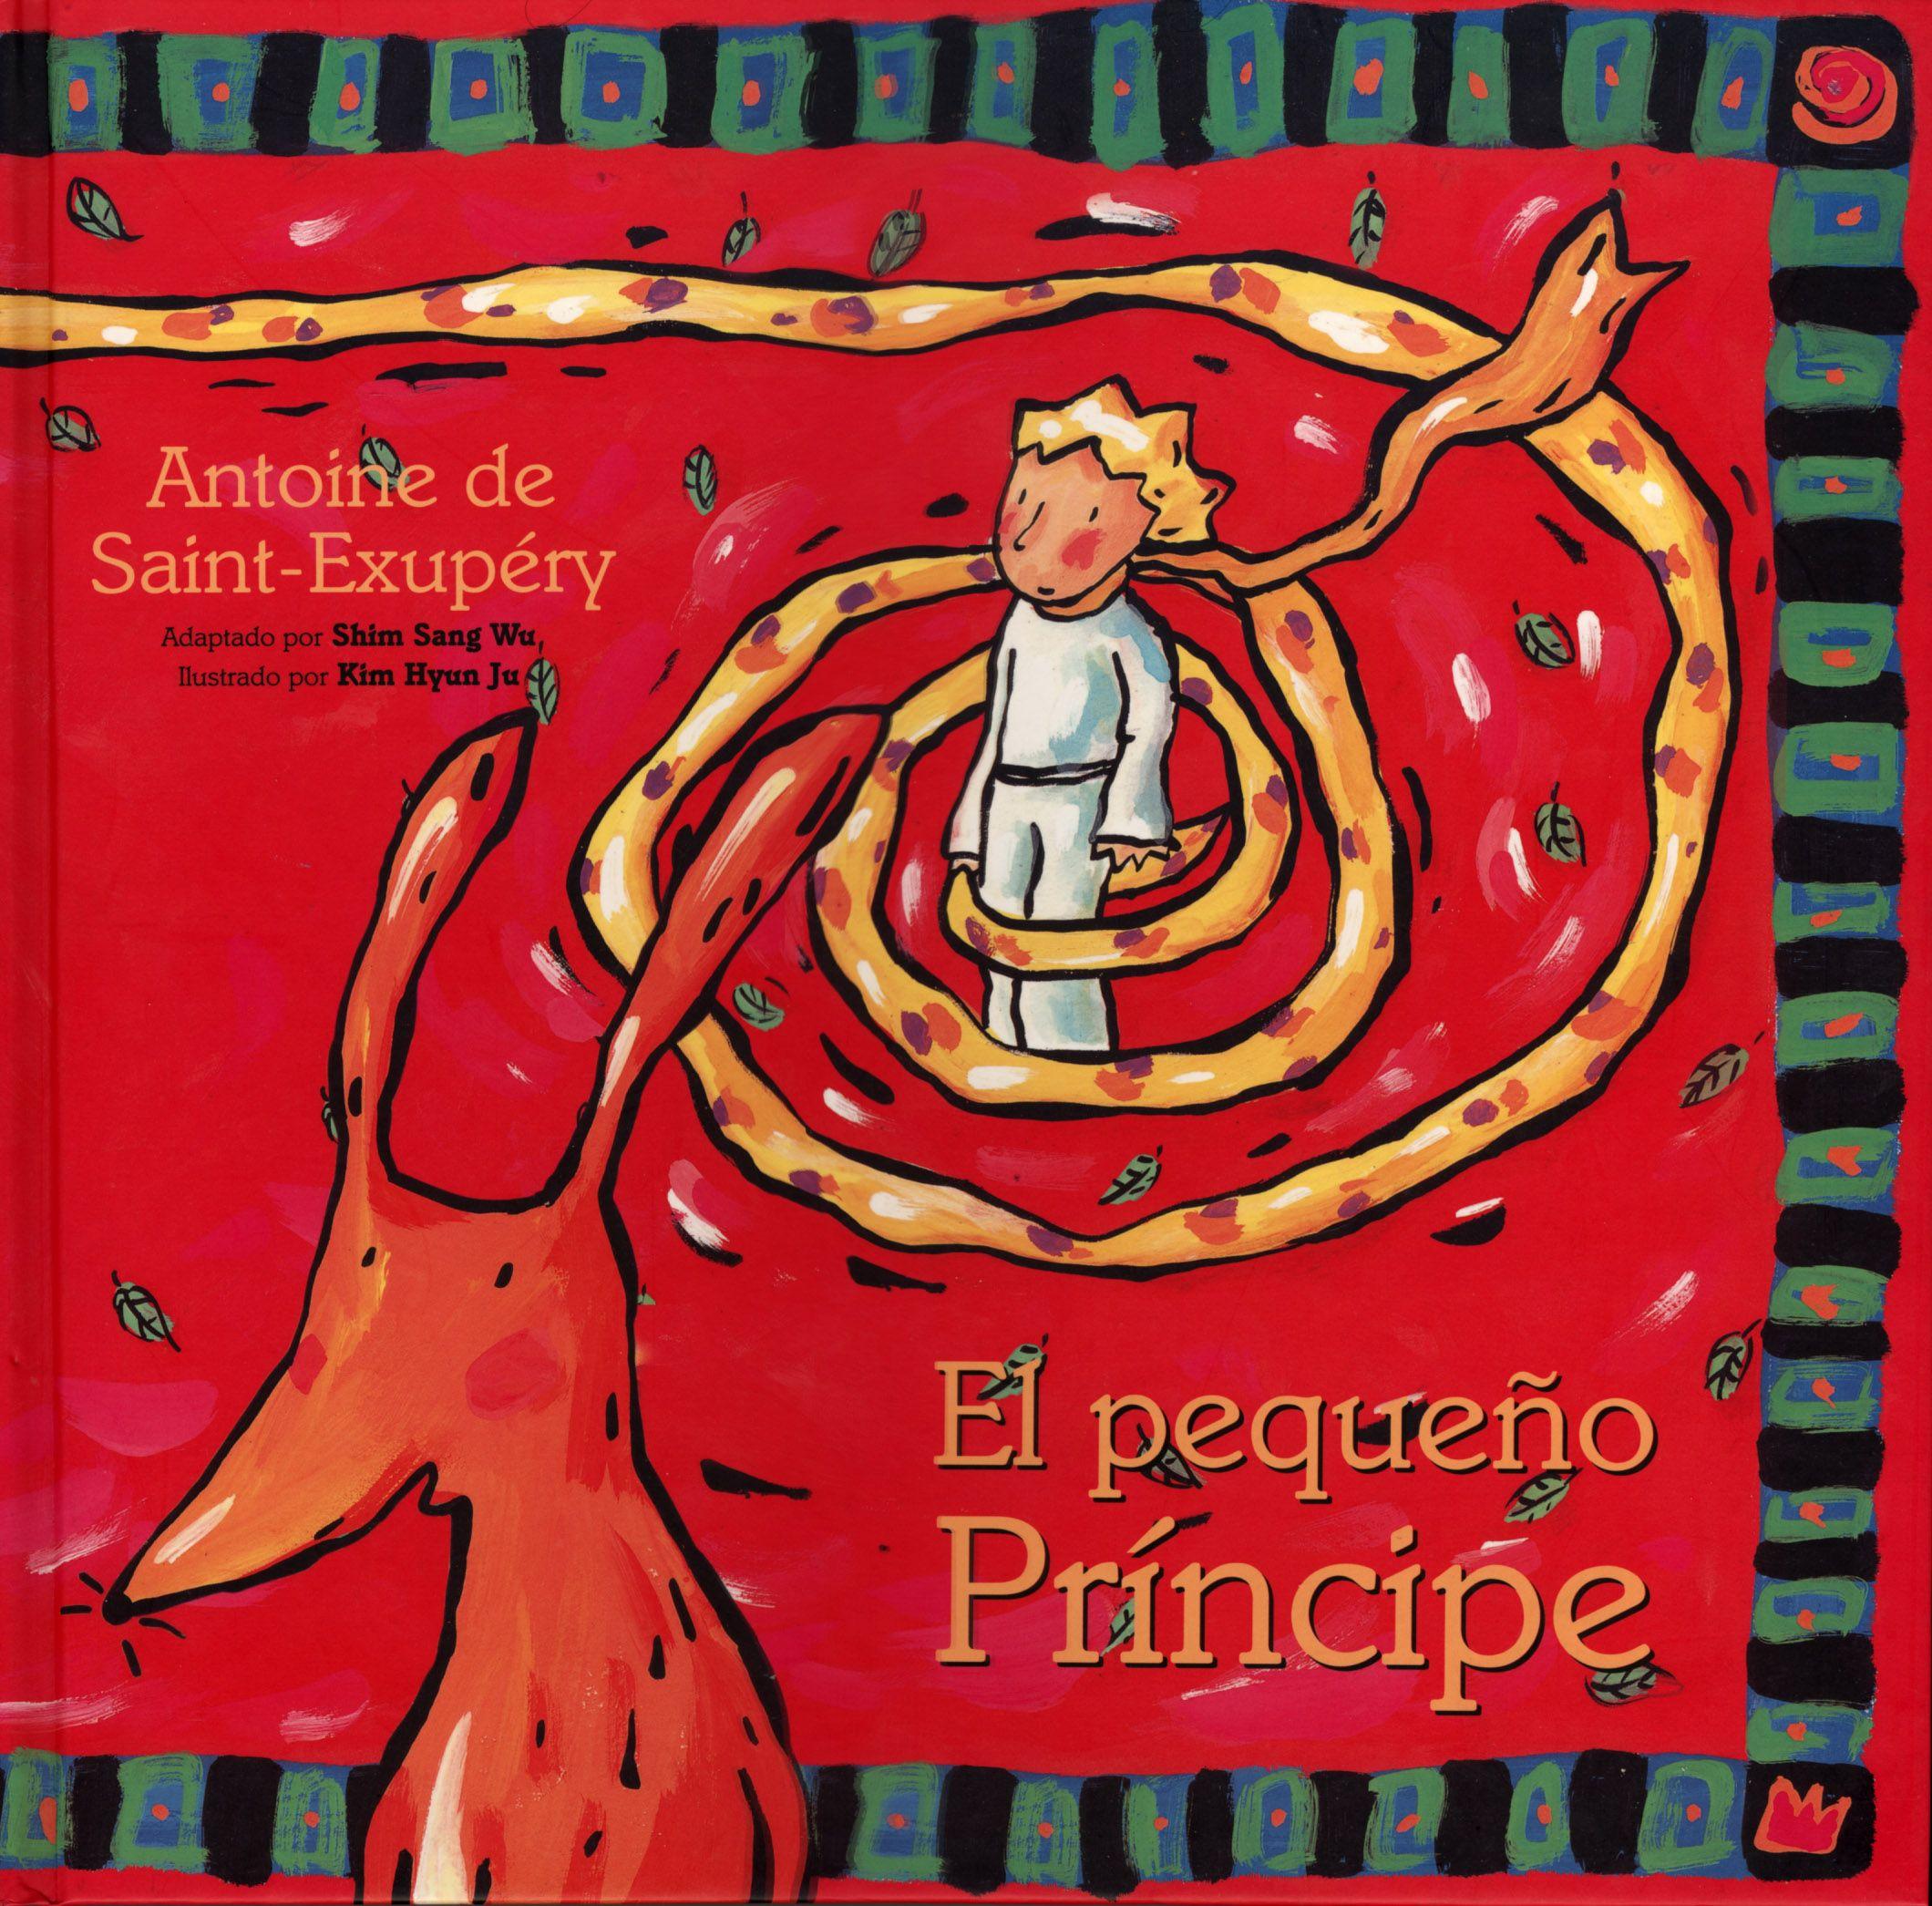 Spanish 185 Little Prince Collection Le Petit Prince The Little Prince Prince Childrens Books